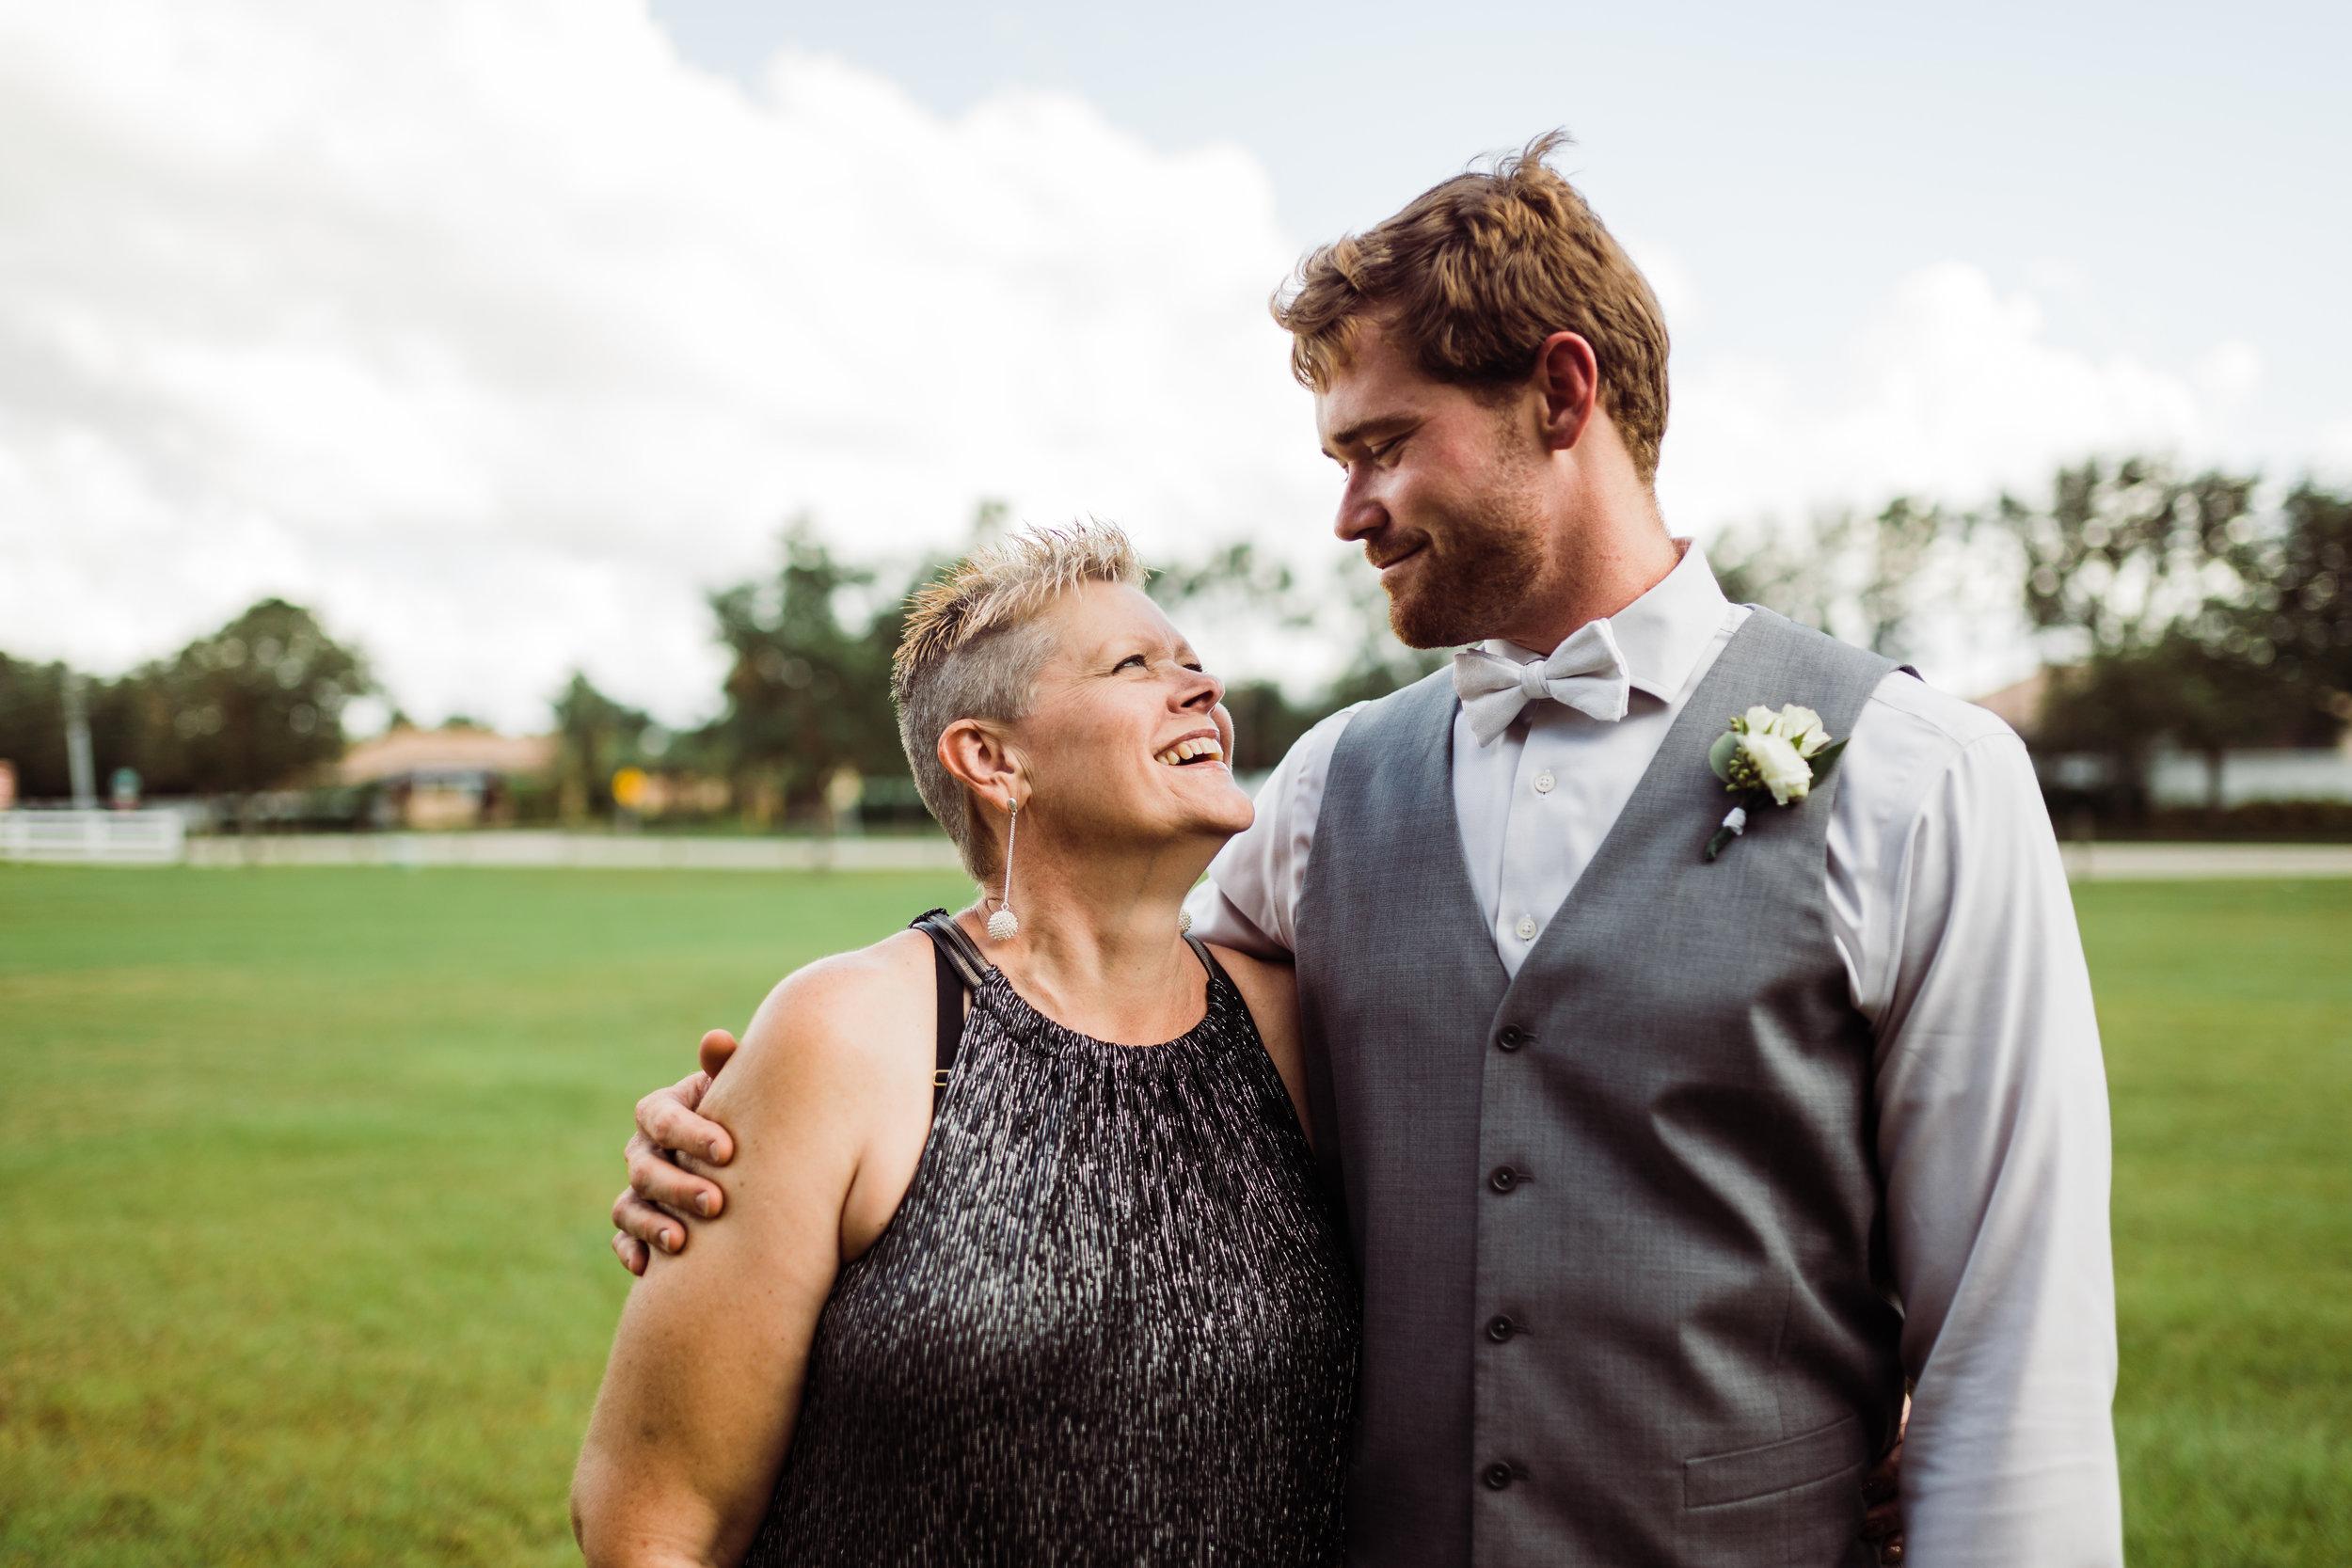 2017.10.14 Samantha and Matthew Crabtree Sarasota Wedding (225 of 708).jpg